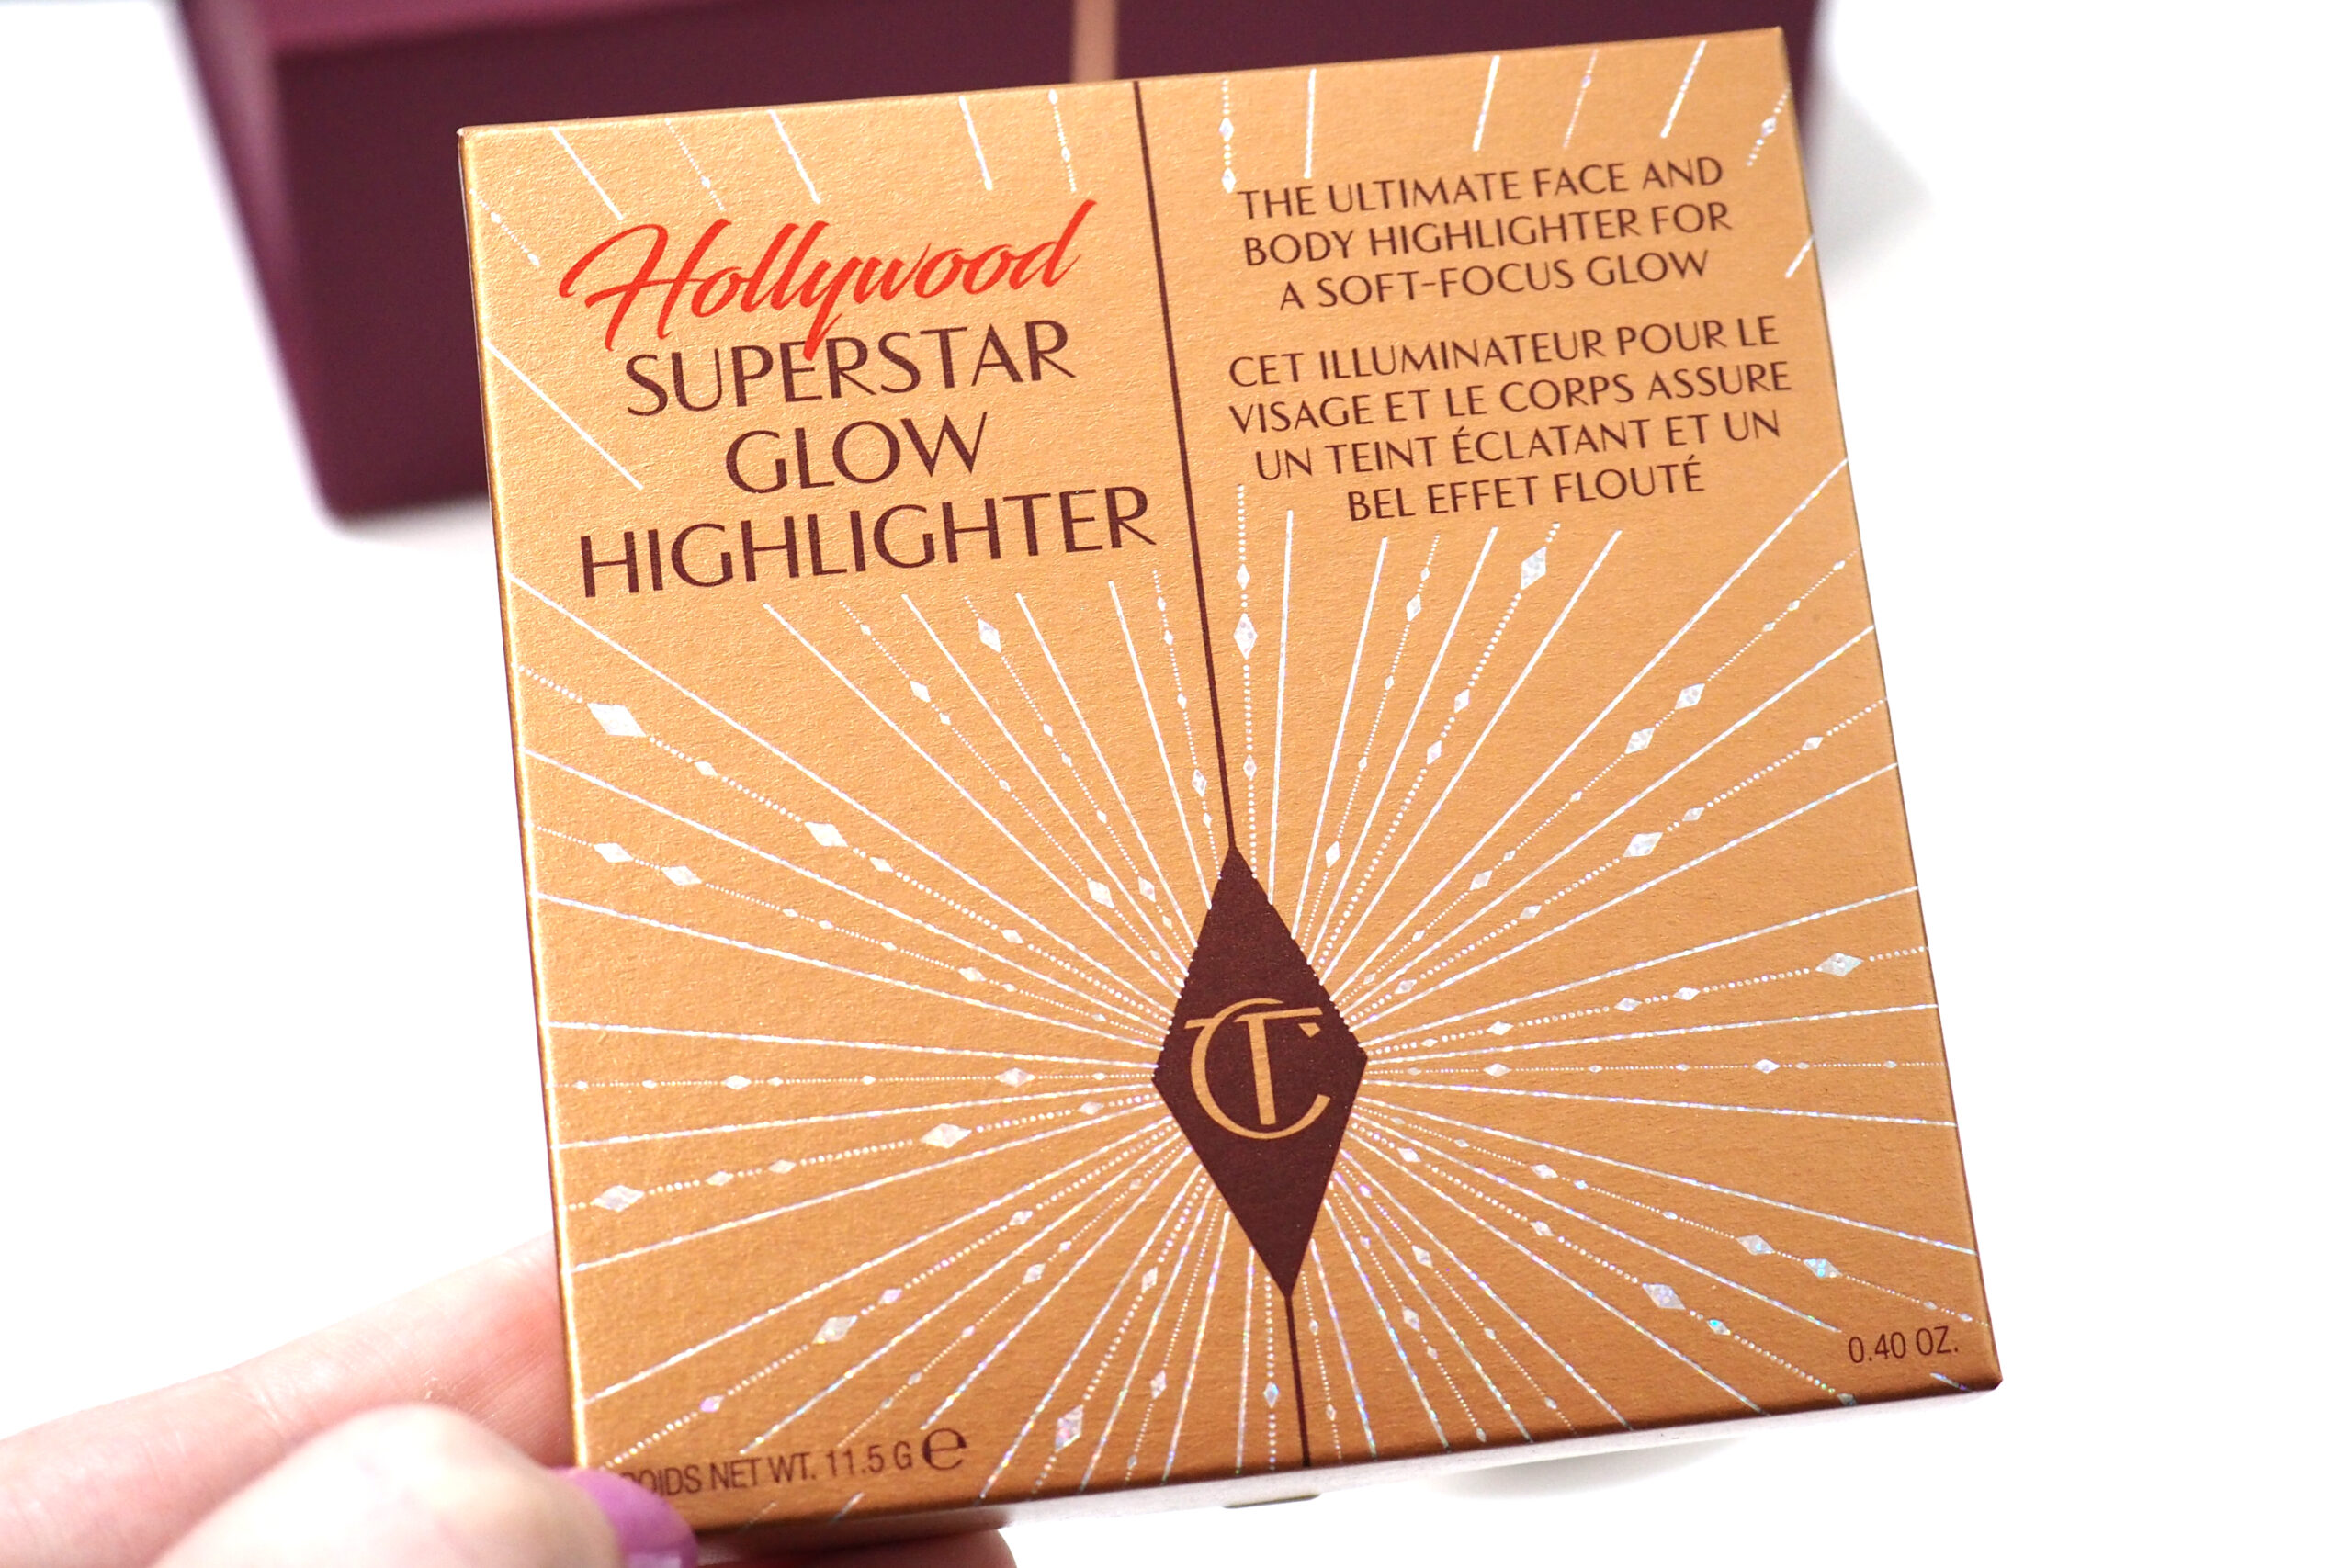 Charlotte Tilbury Beauty Secrets Mystery Box Unboxing + Reveal!